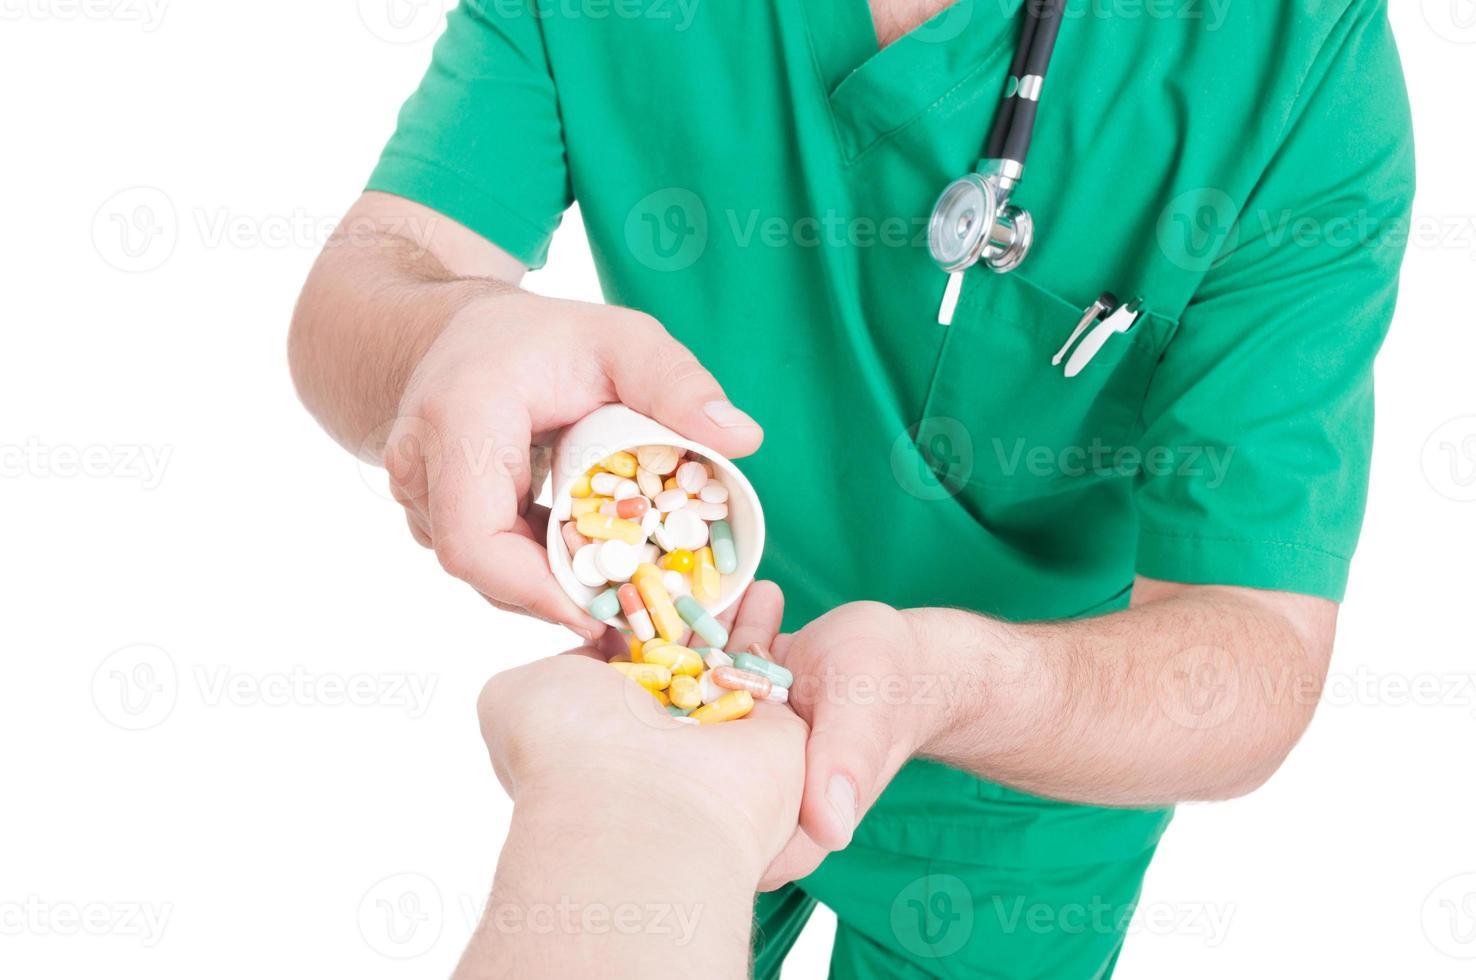 medico, medico o farmacista versando pillole in mano del paziente foto